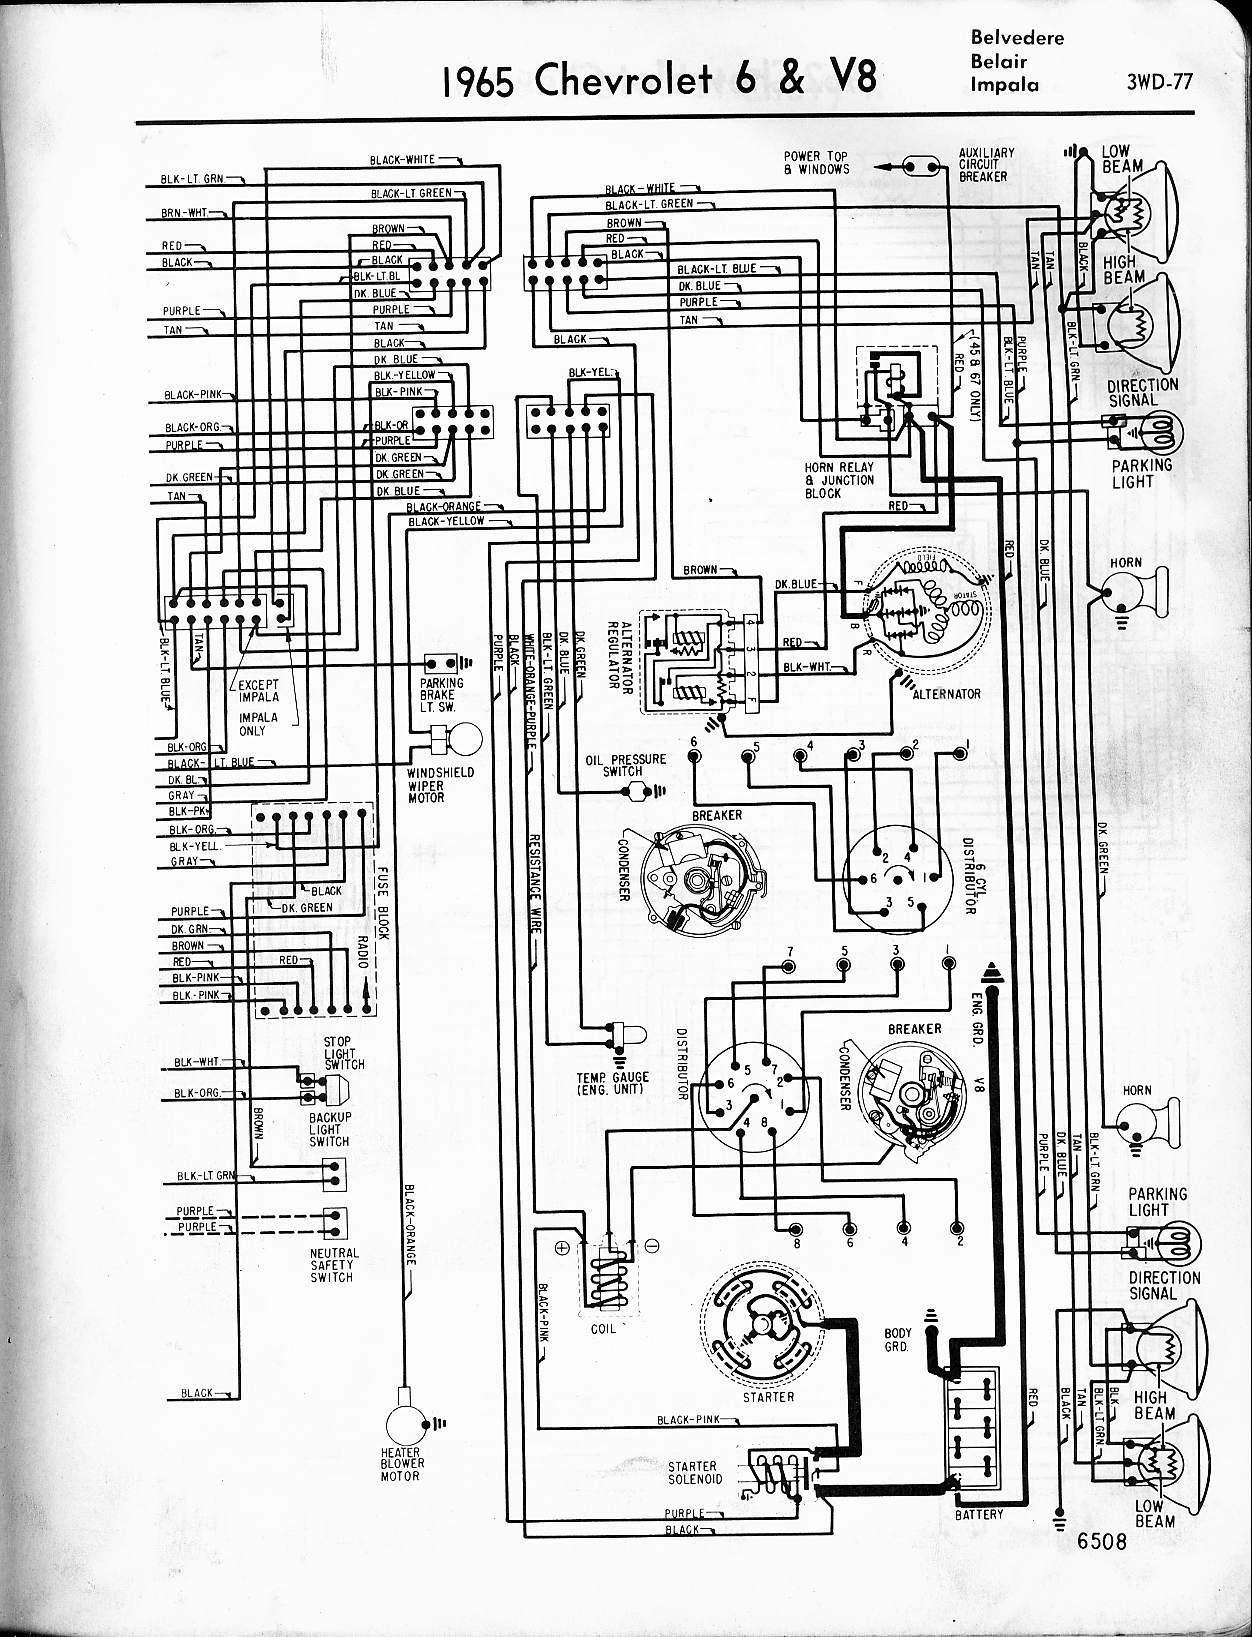 1964 Cadillac Wiring Diagram | Wiring Diagram on